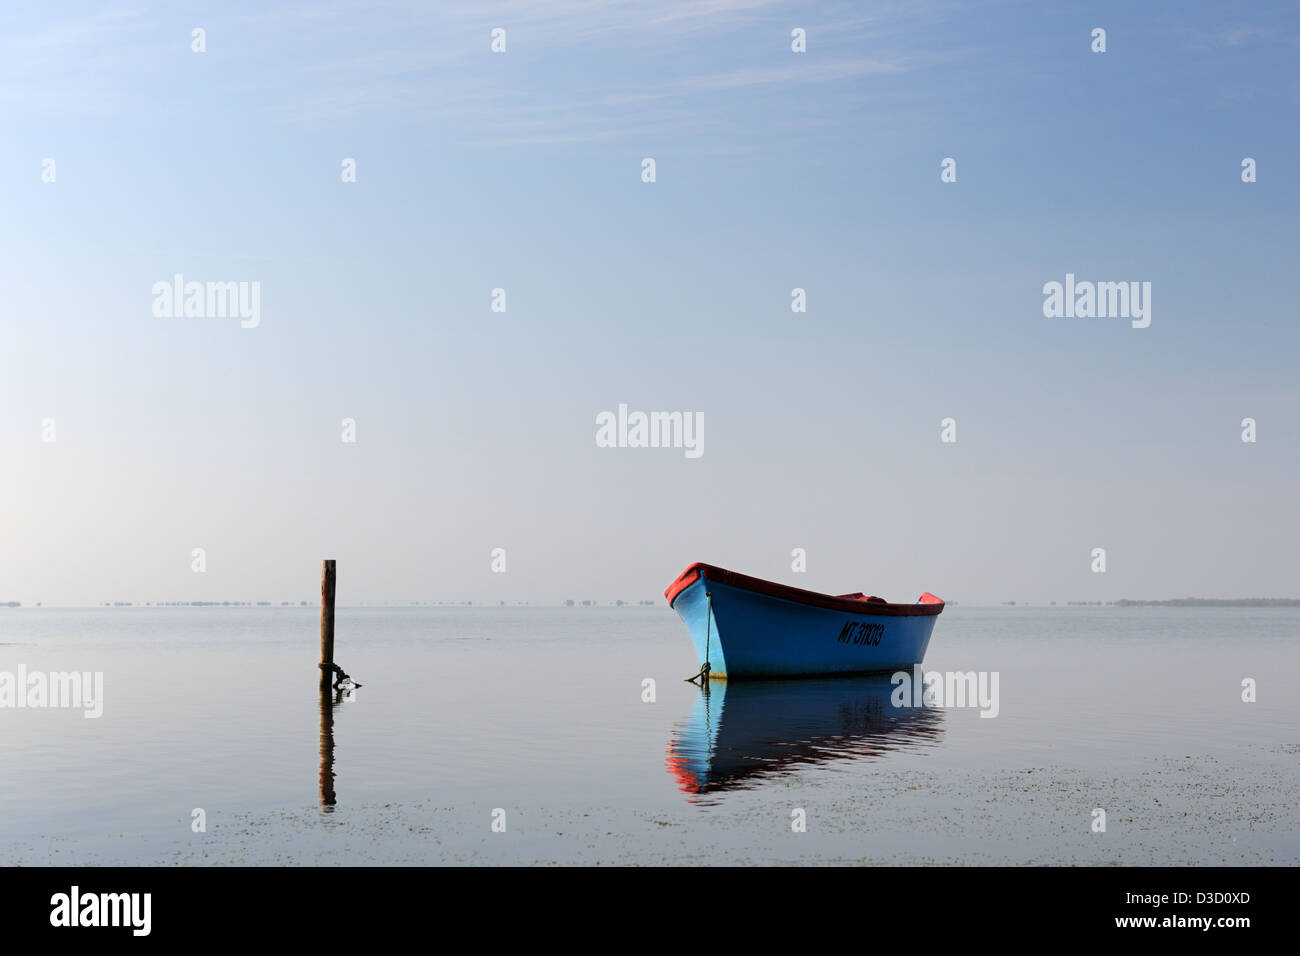 Fishing boat in a lagune. - Stock Image